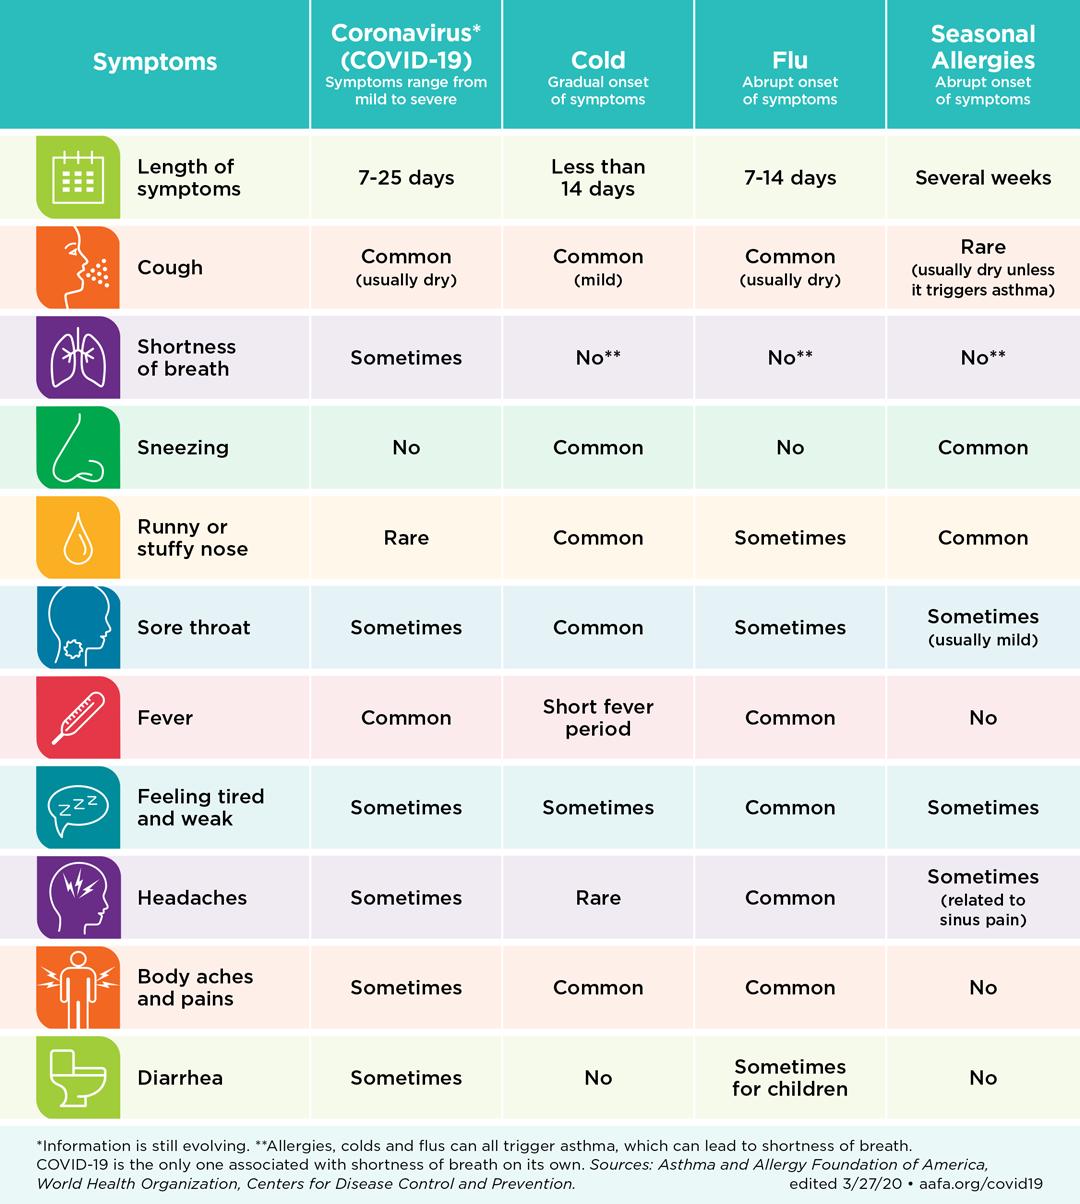 Respiratory Illness Symptoms Chart Coronavirus Flu Cold Allergies Propeller Health